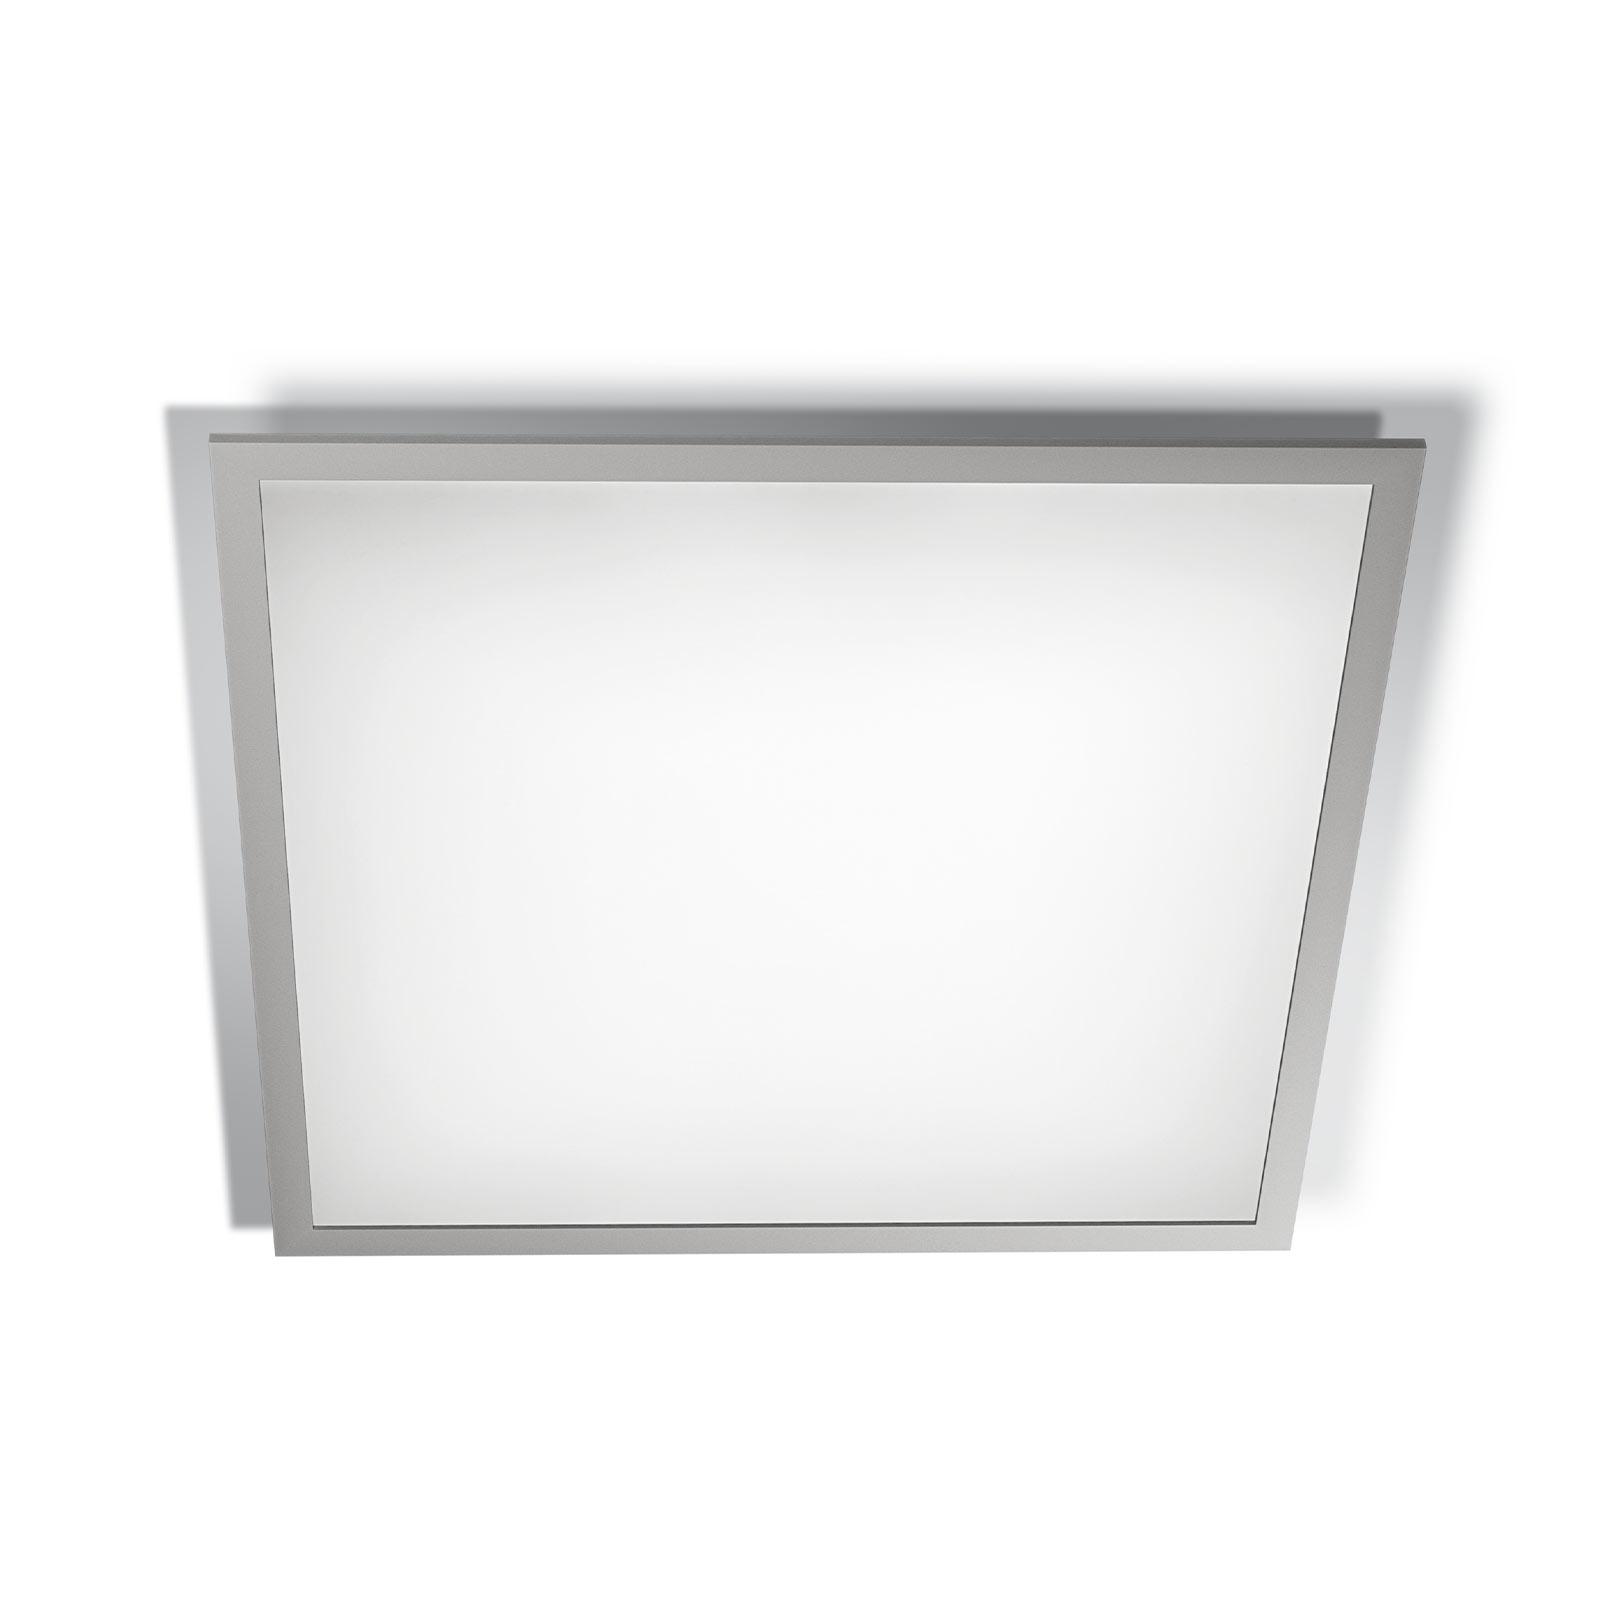 LEDVANCE Planon Plus panel LED 60x60cm 830 36W